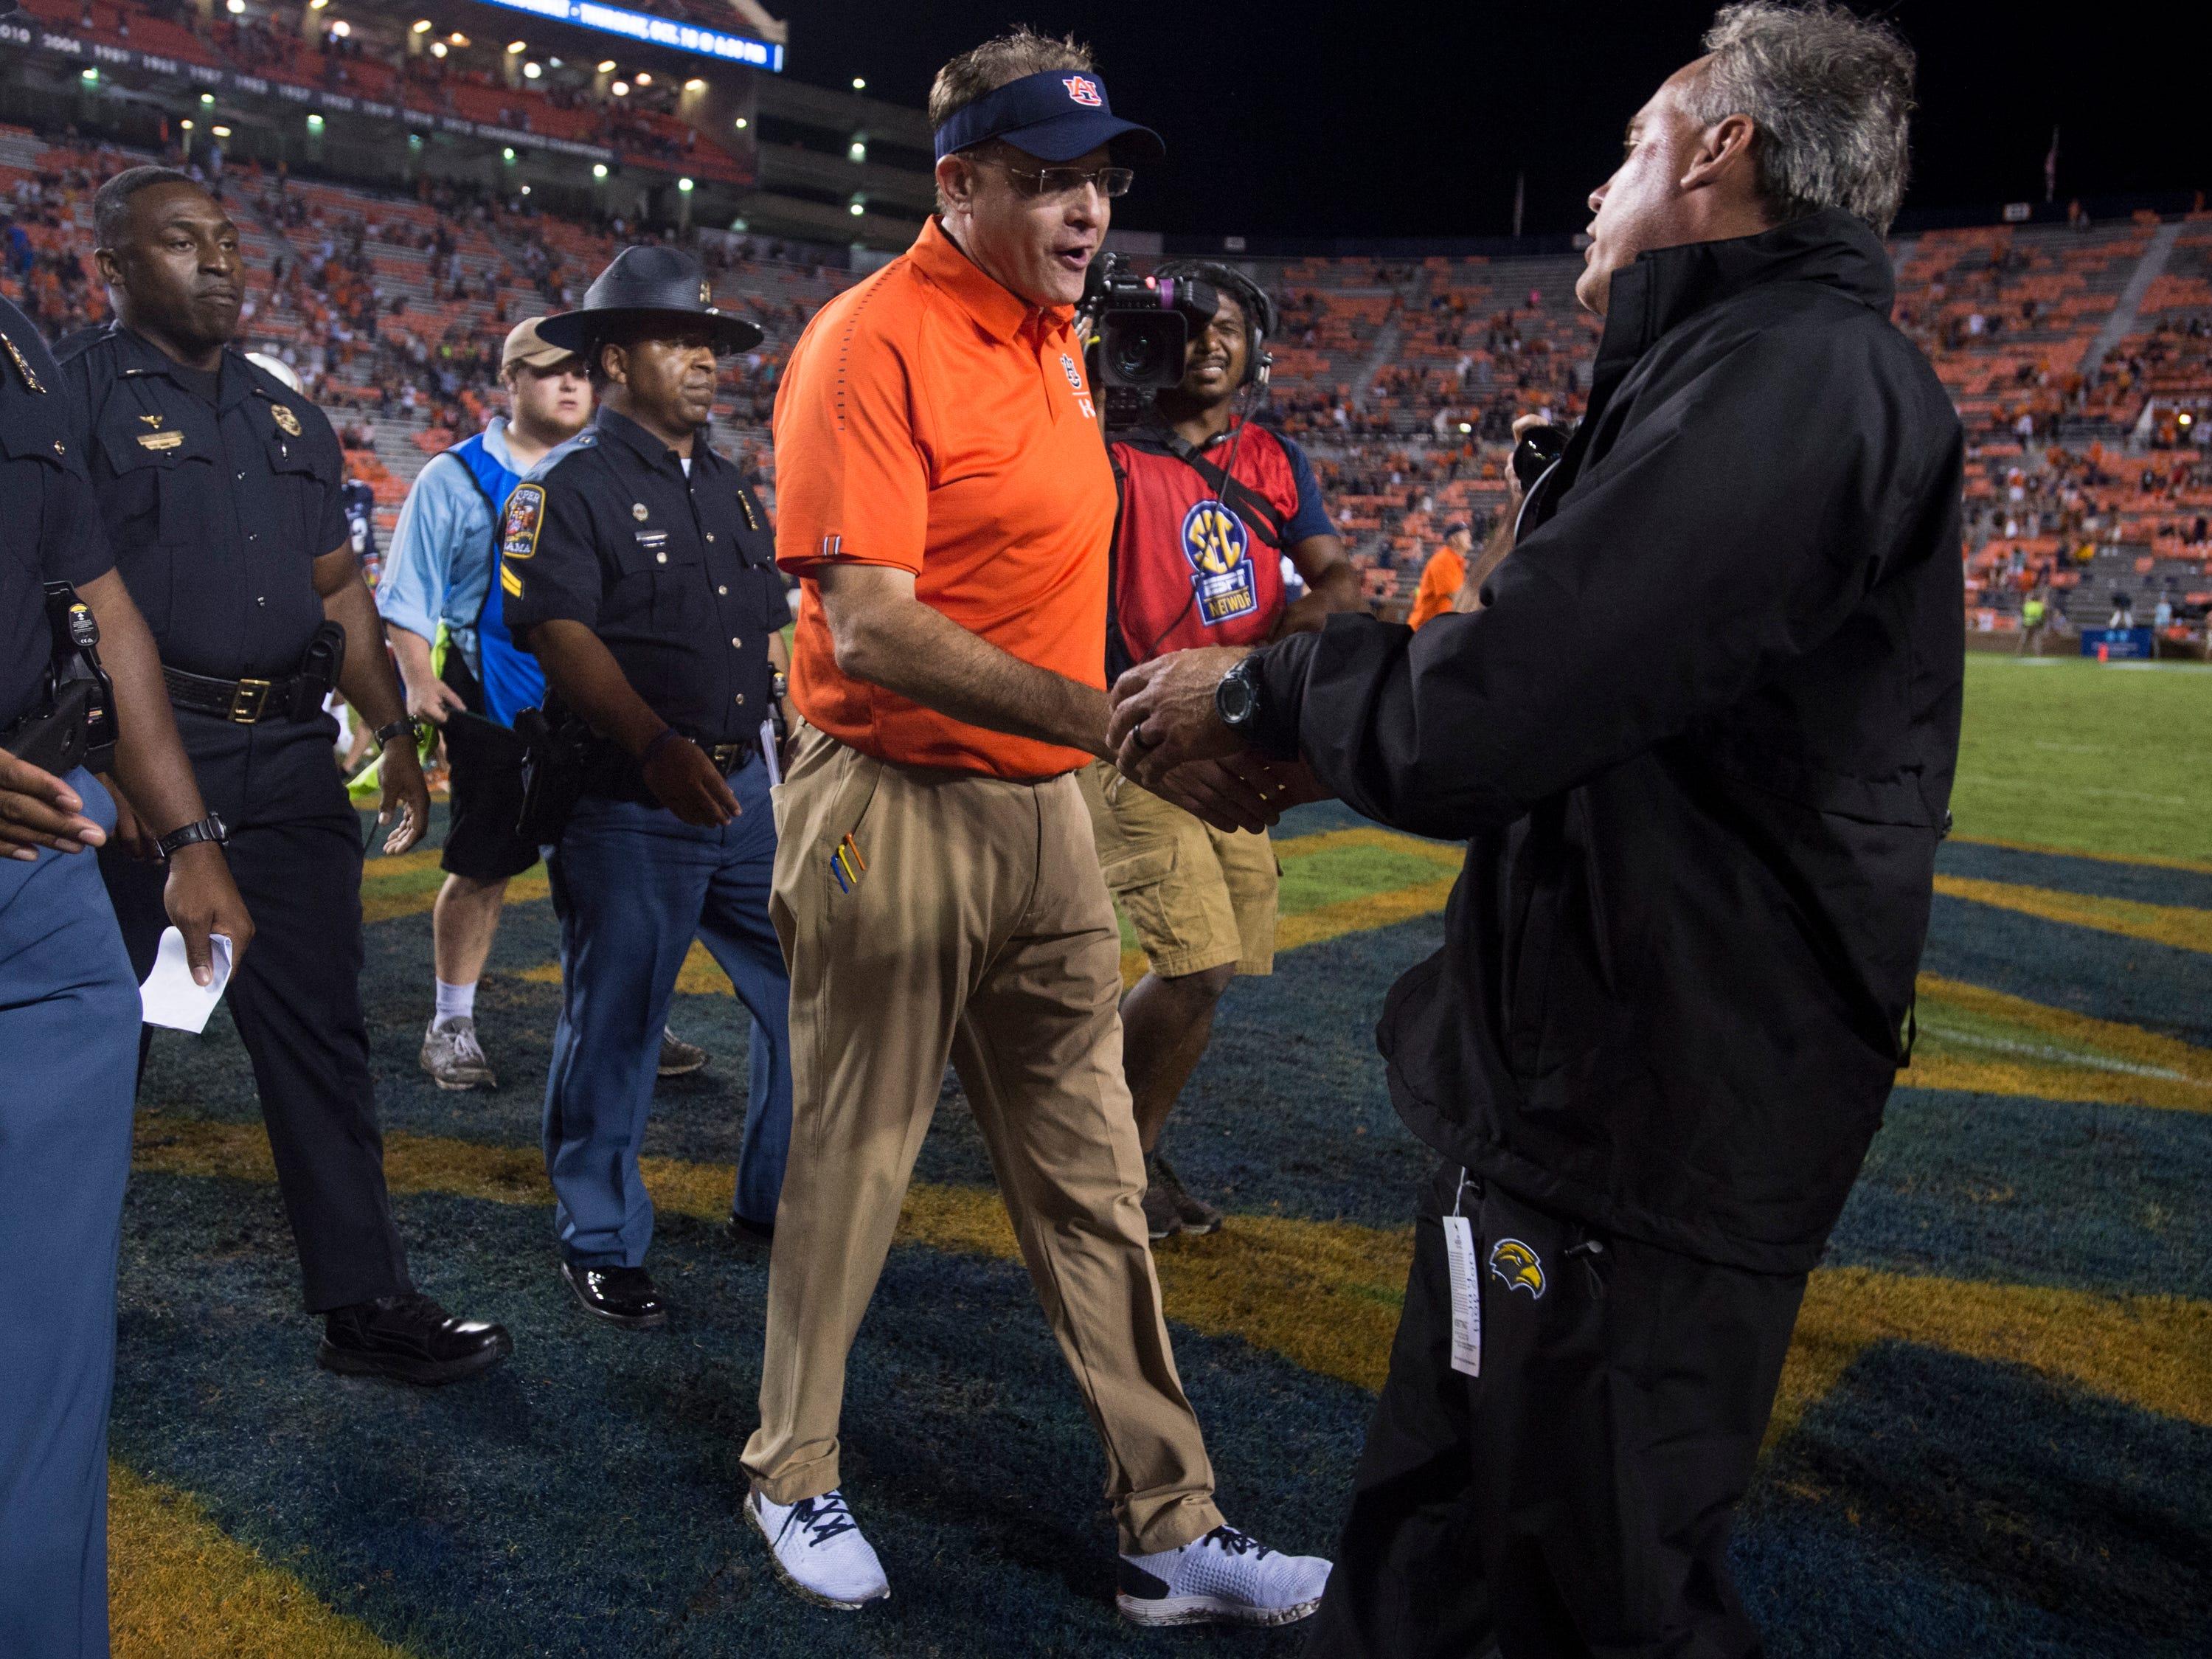 Auburn head coach Gus Malzahn shakes hands with Southern Miss head coach Jay Hopson following the game at Jordan-Hare Stadium in Auburn, Ala., on Saturday, Sept. 29, 2018. Auburn defeated  Southern Miss 24-13.